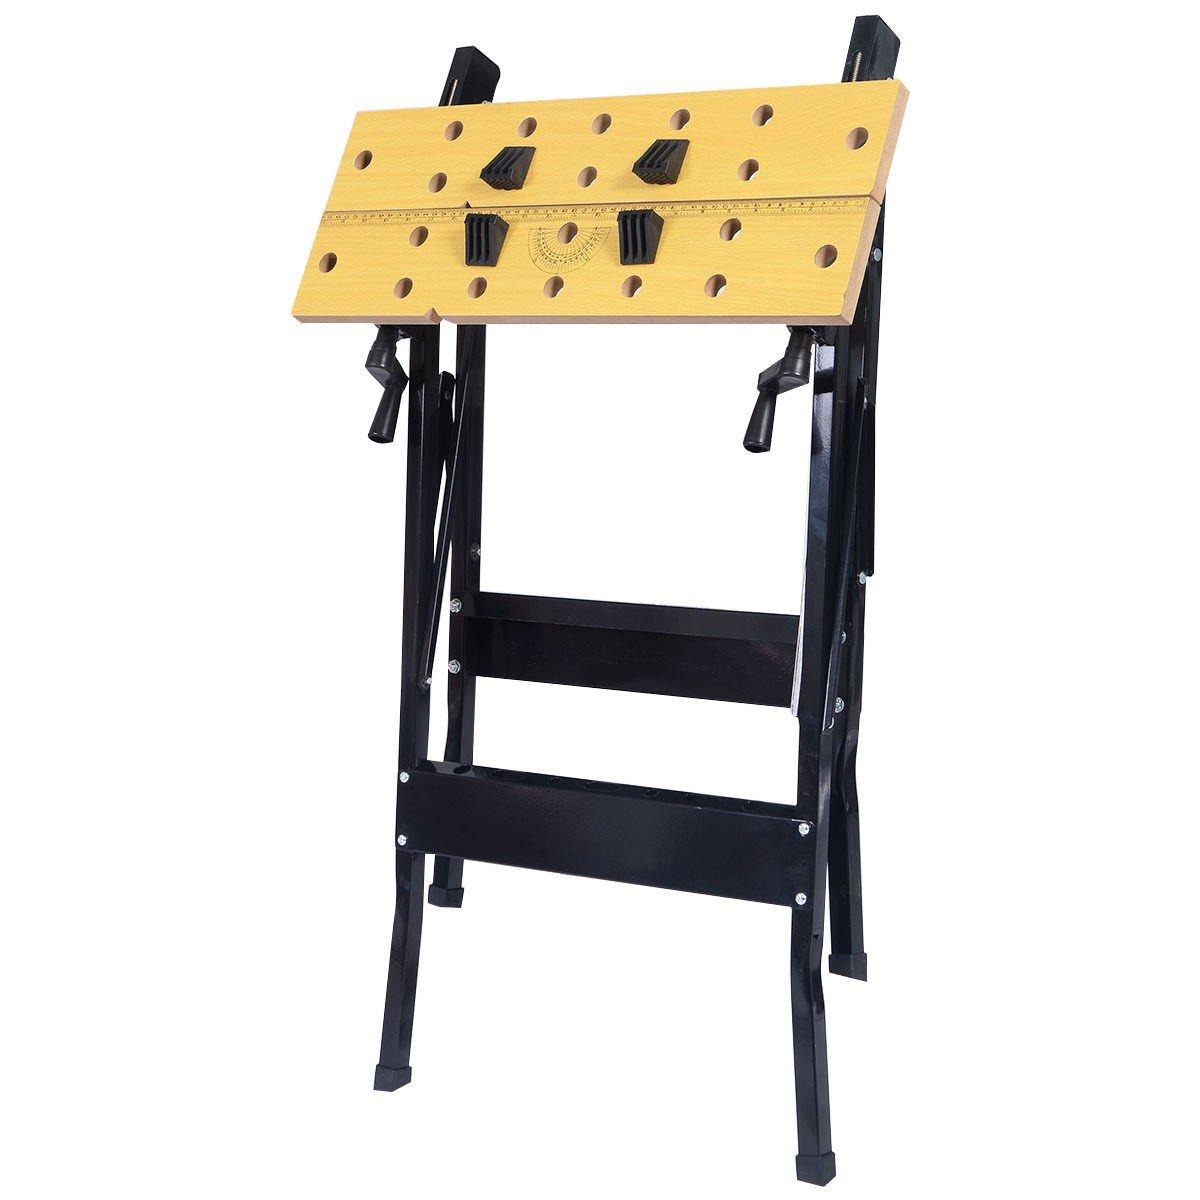 Folding Work Bench Table Tool Garage Repair Workshop